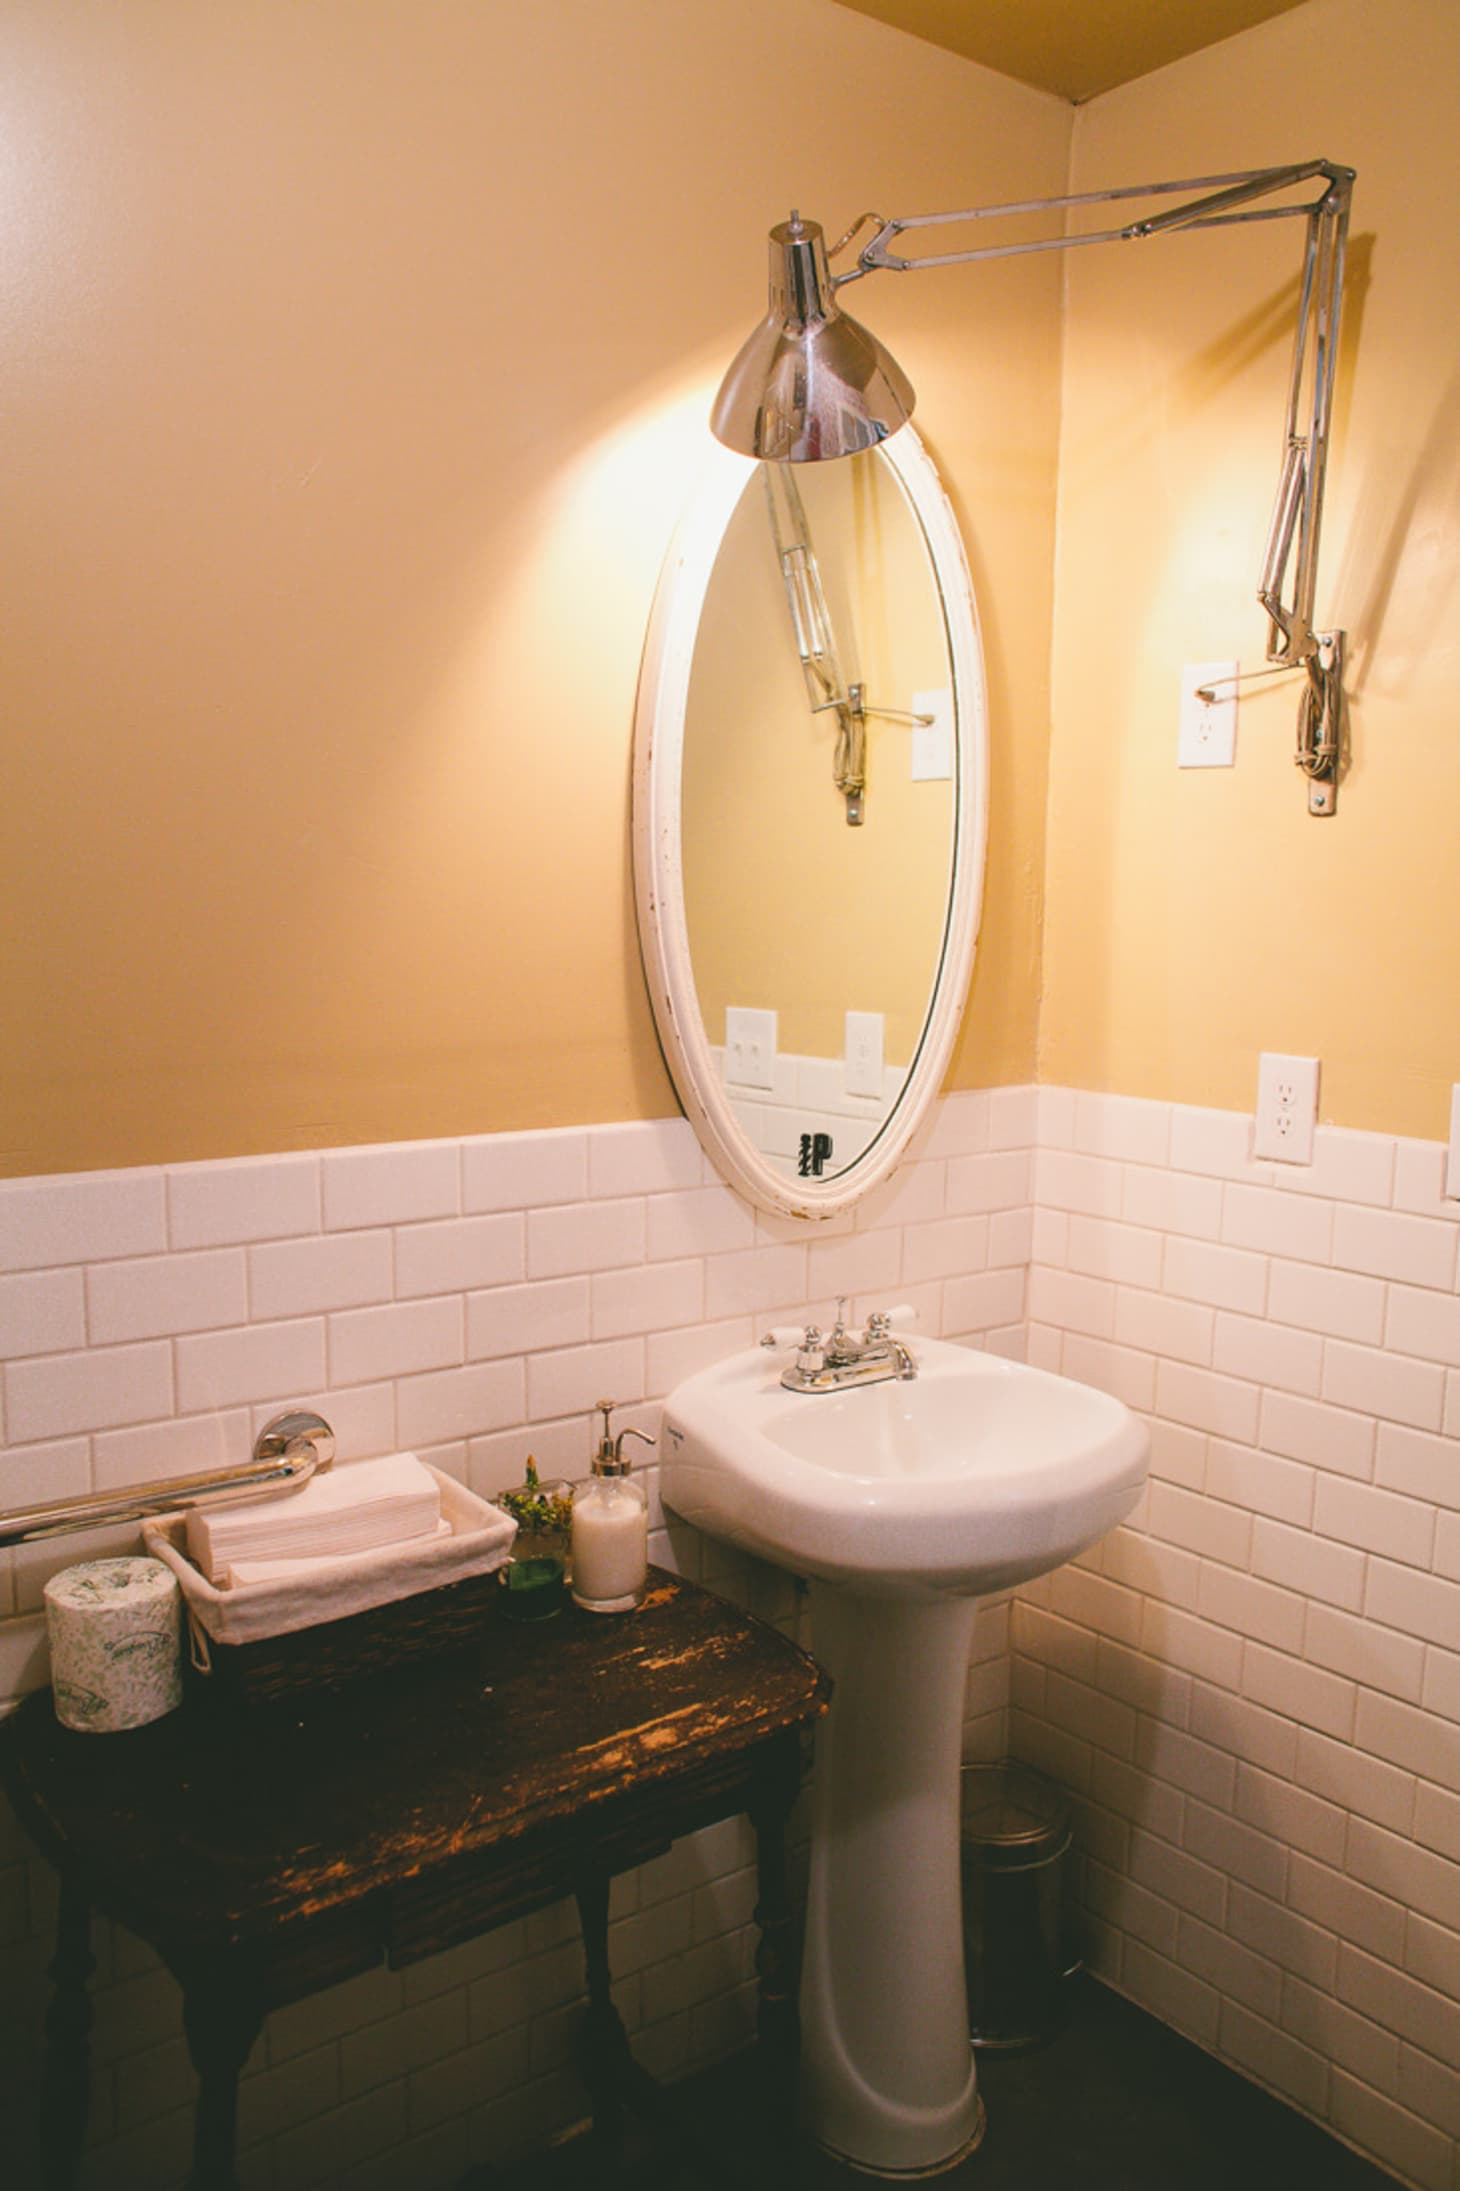 Small Bathroom Ideas: 6 Room Brightening Tips for Tiny ... on Small Apartment Bathroom  id=17593